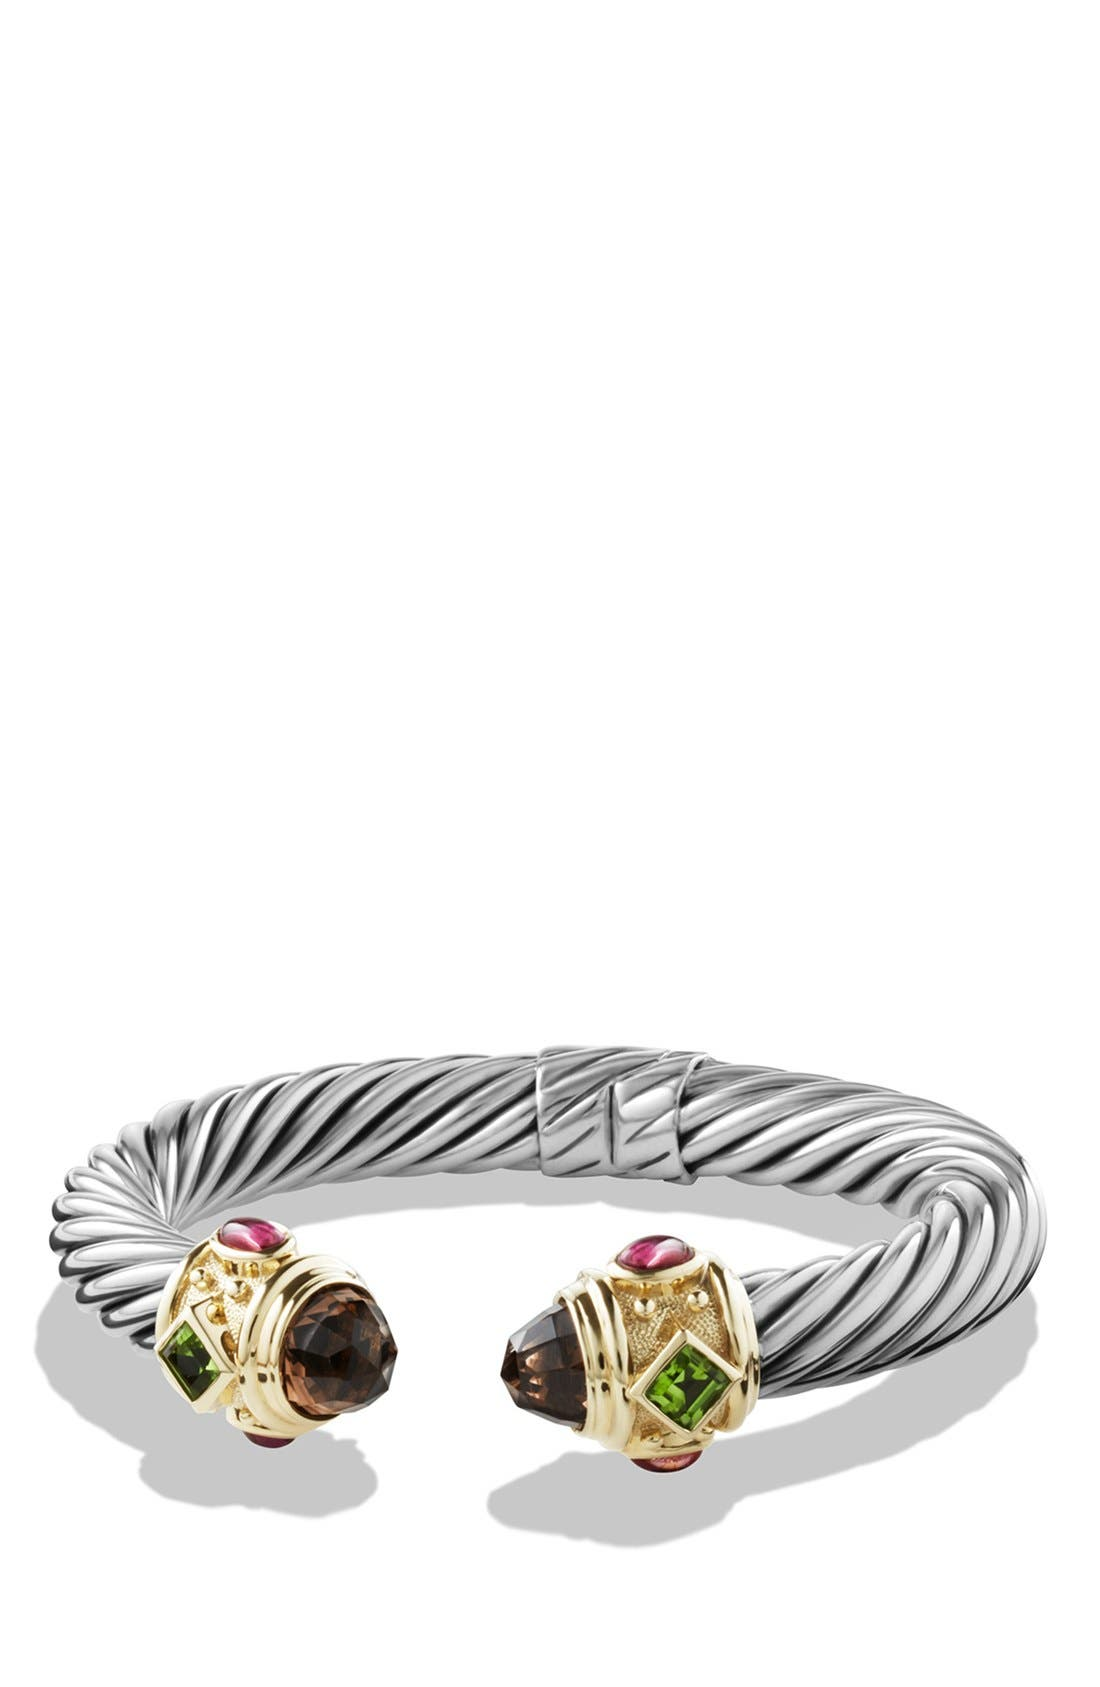 Main Image - David Yurman 'Renaissance' Bracelet with Semiprecious Stones & Gold